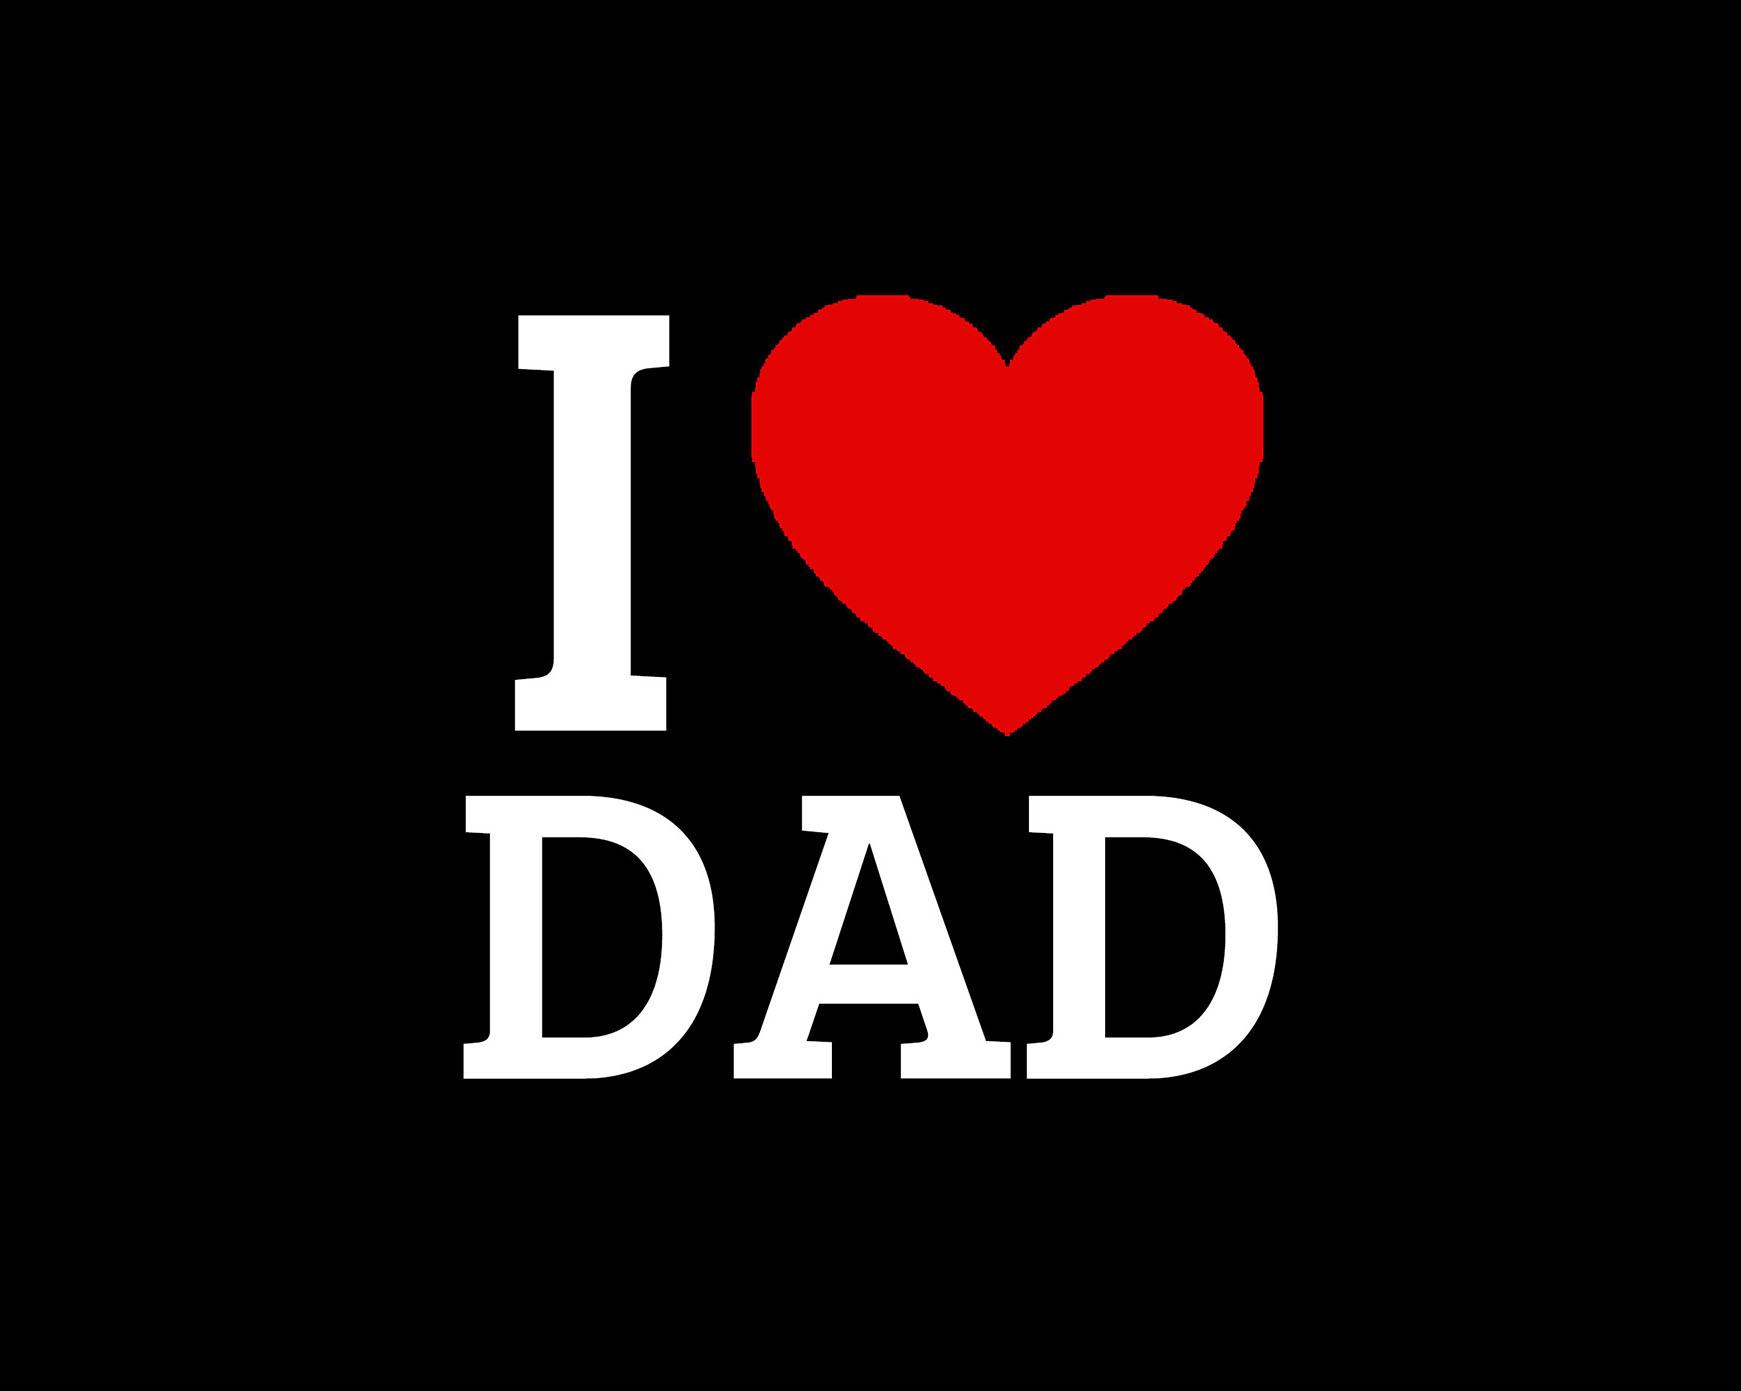 231-I-love-dad.jpg